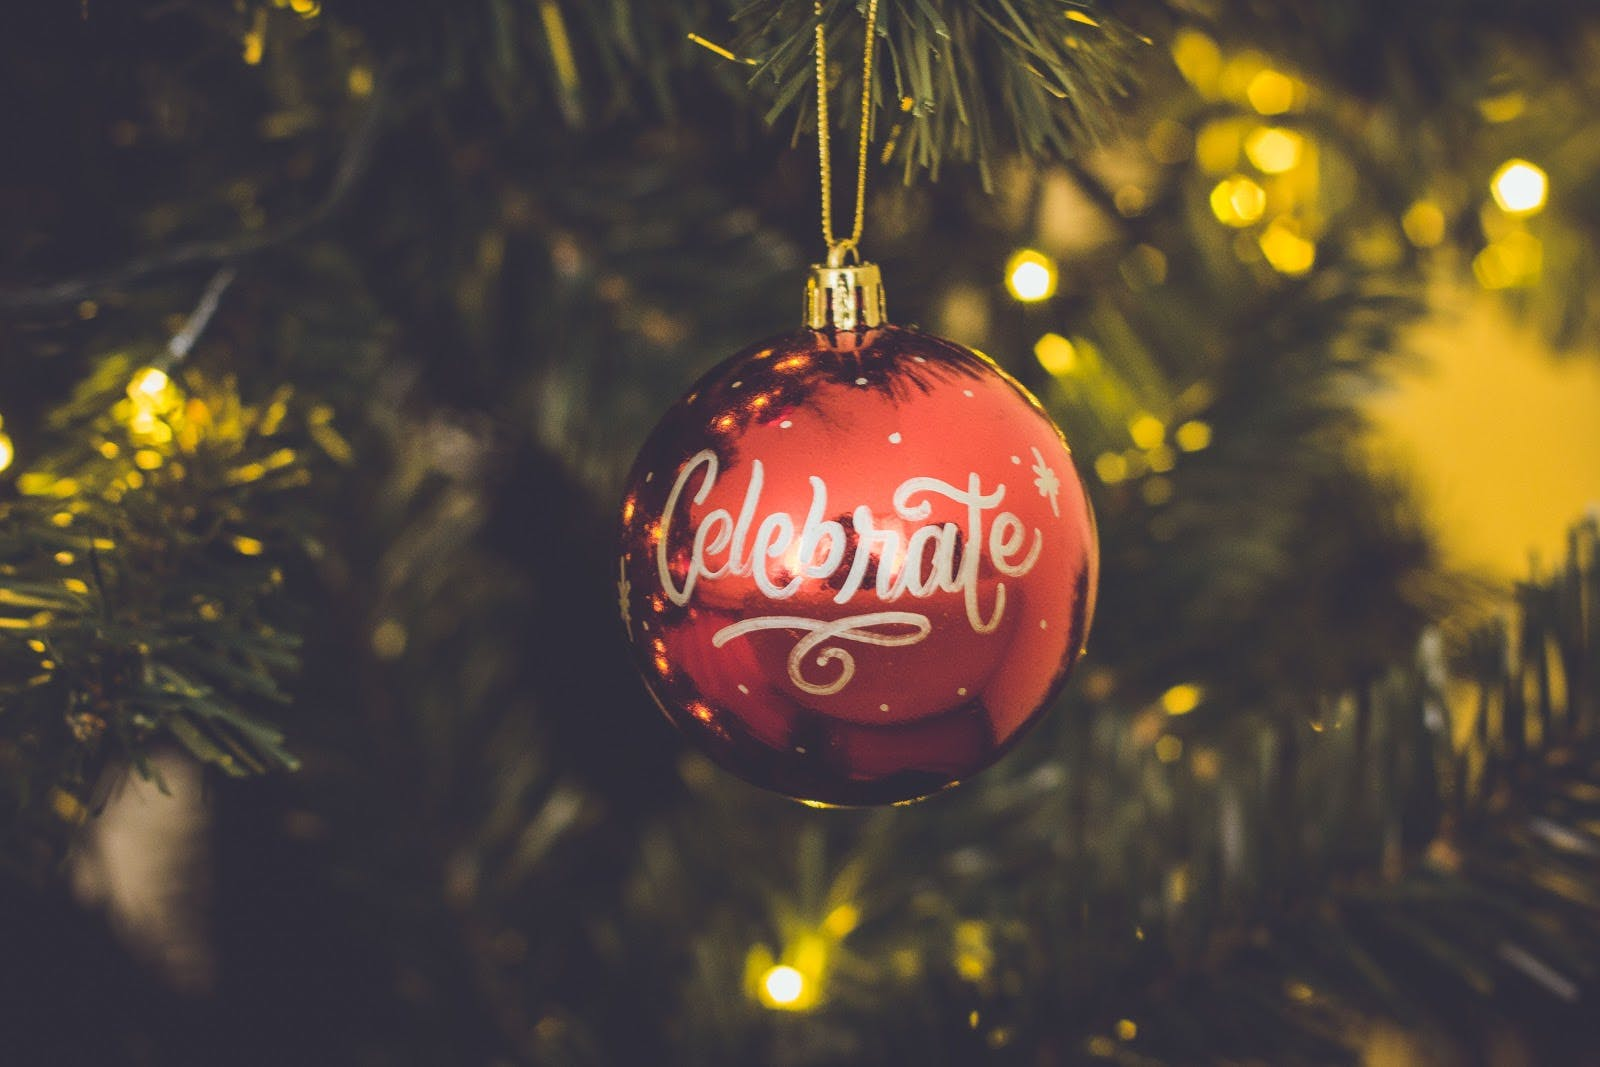 Celebrate holiday ornament.